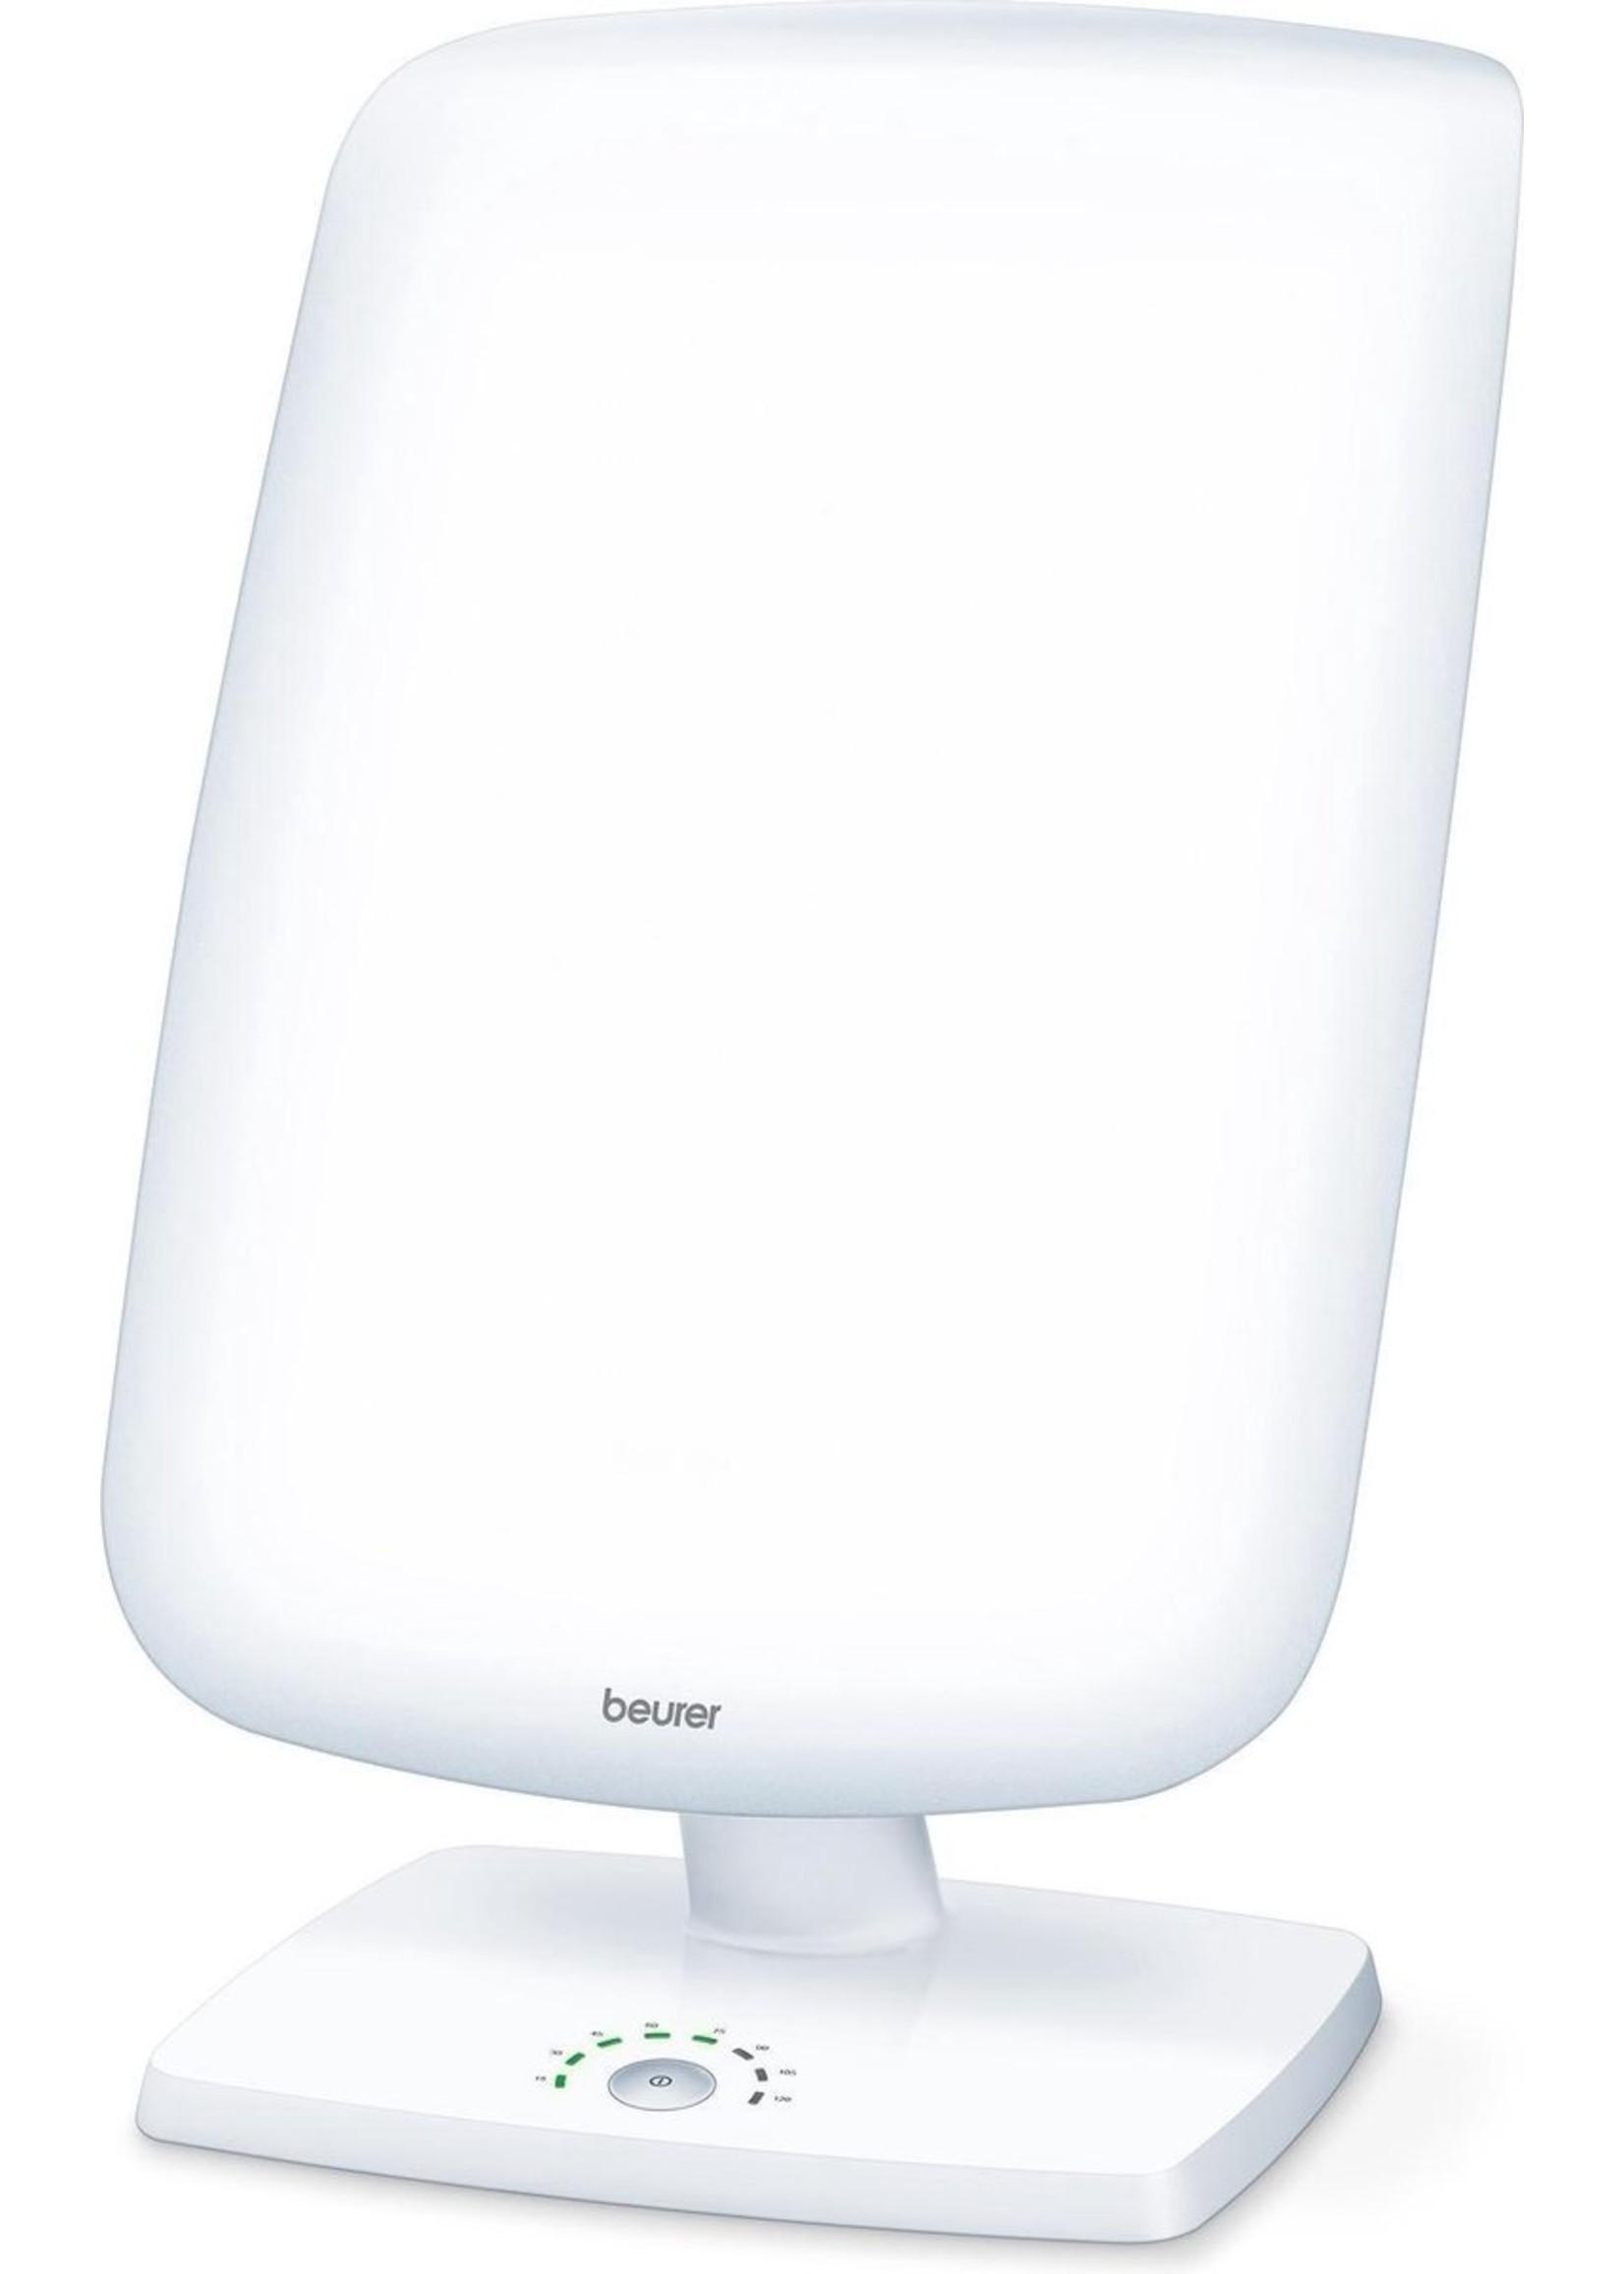 Beurer Beurer TL90 - Daglichtlamp - Groot - 58x38cm